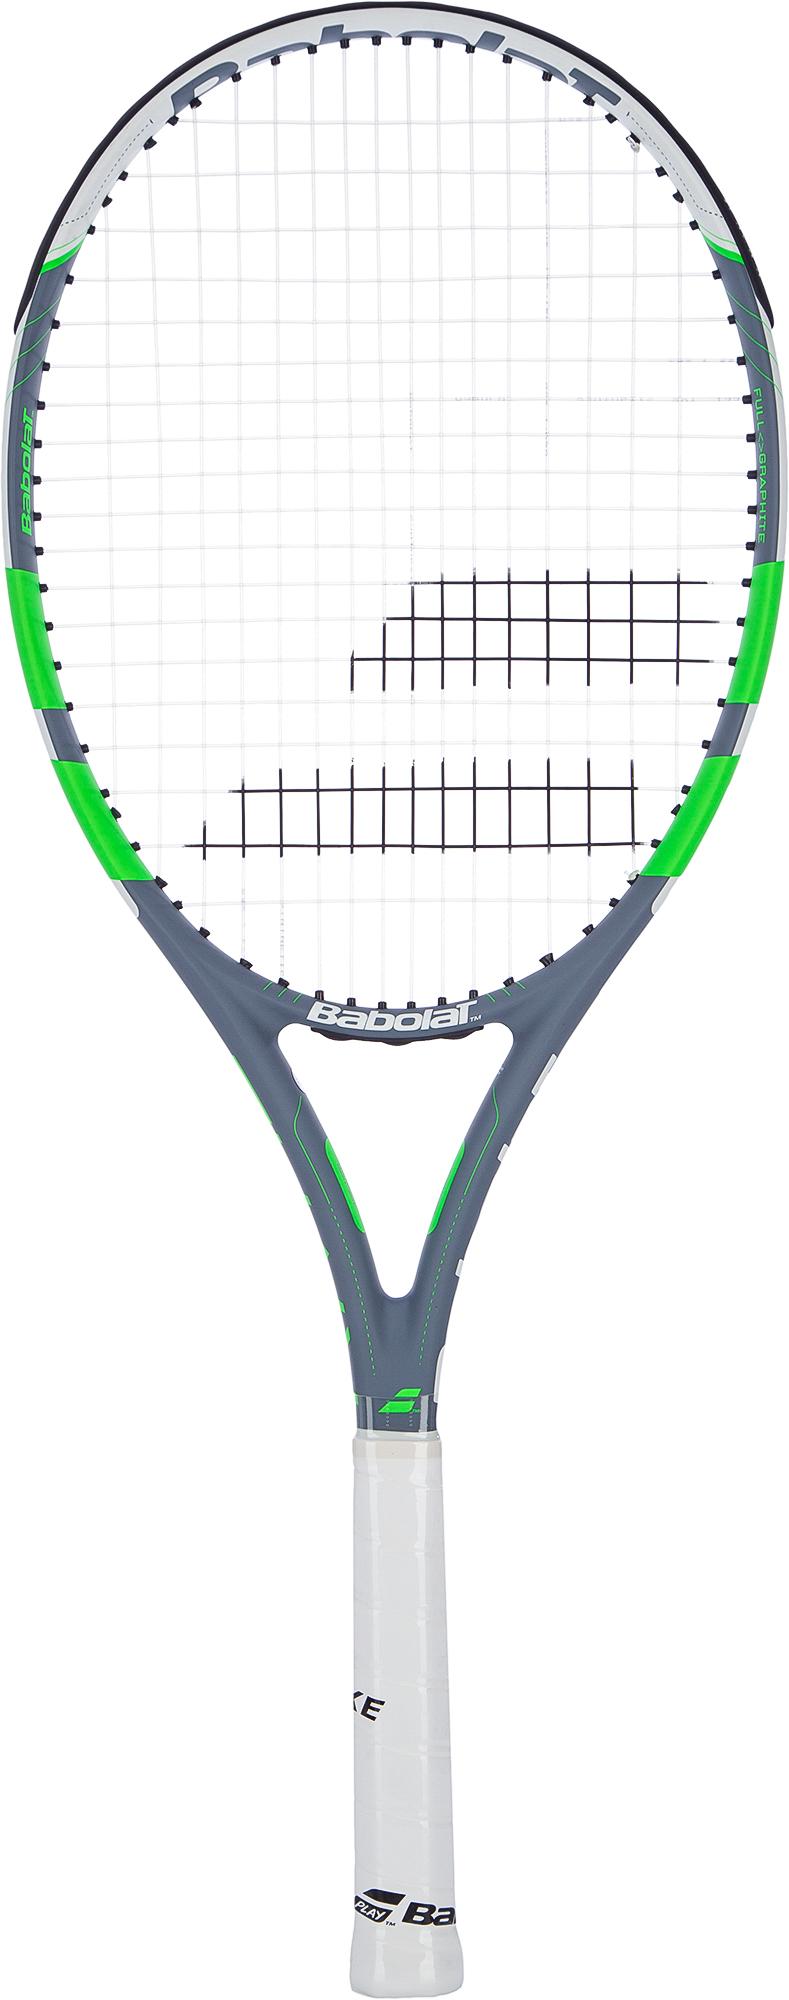 Babolat Ракетка для большого тенниса Babolat RIVAL 102 babolat ракетка для большого тенниса детская babolat ballfighter 23